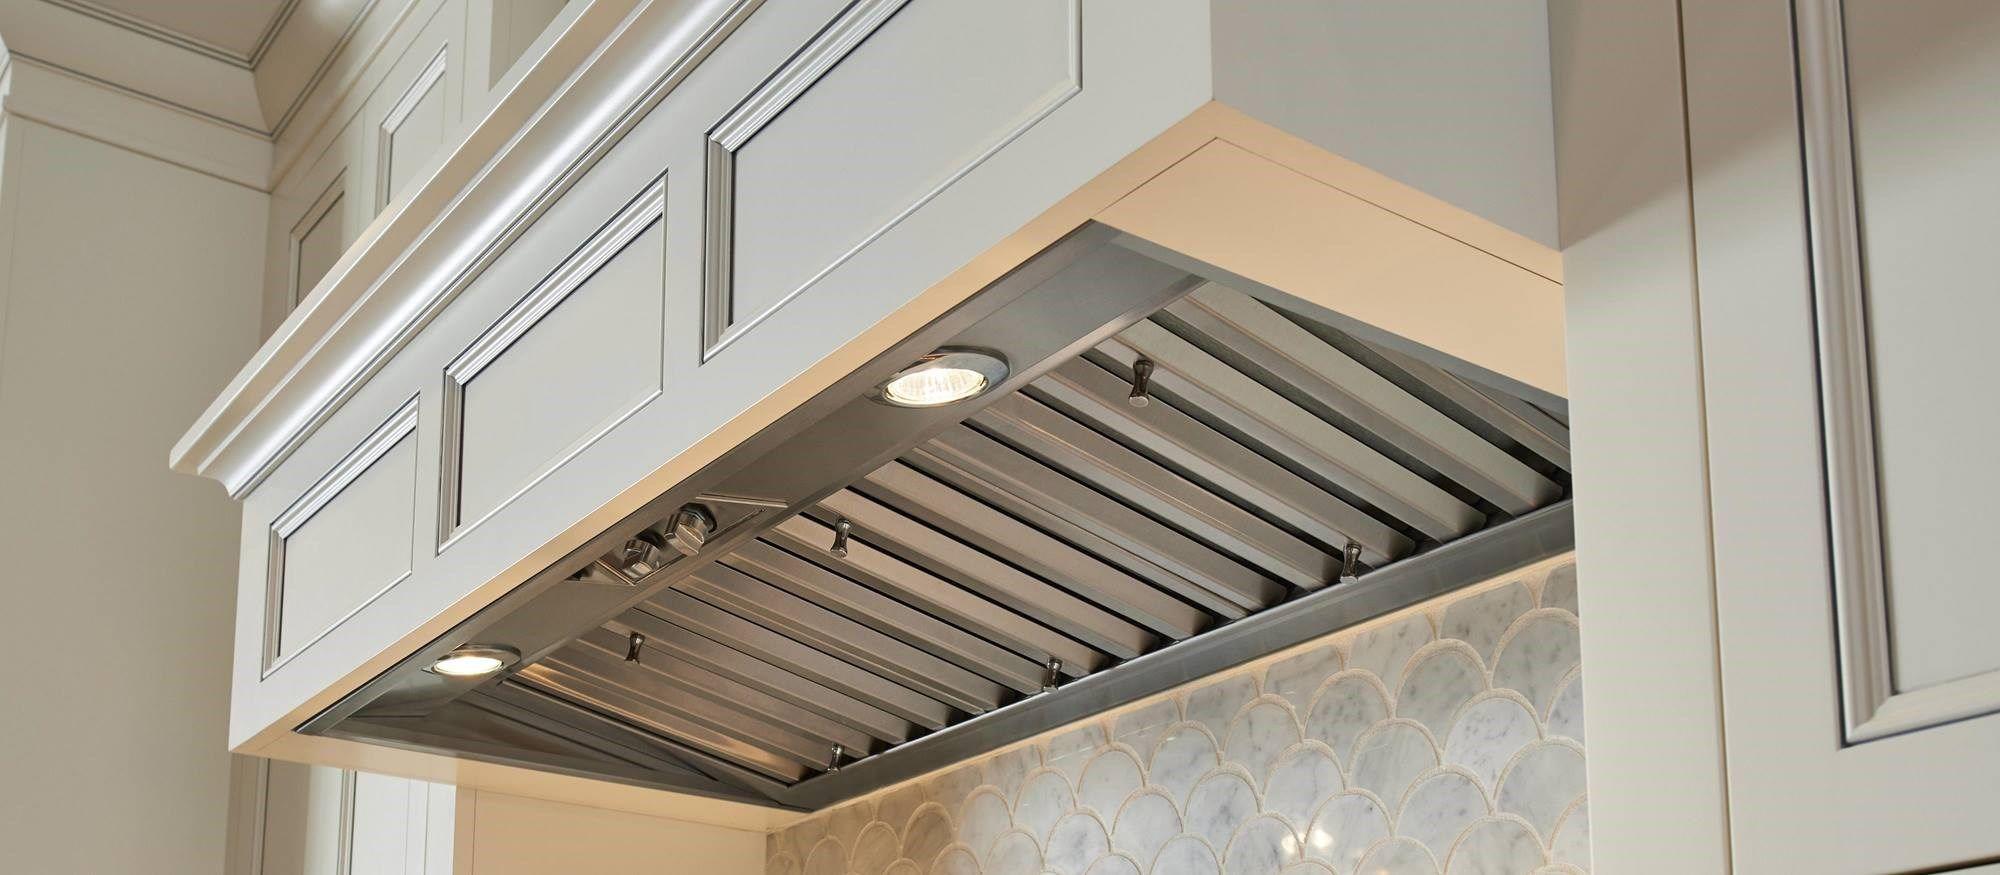 Wolf 40 Pro Hood Liner 19 Depth Pl401912 Ventilation Hood Built In Ovens Custom Cabinetry